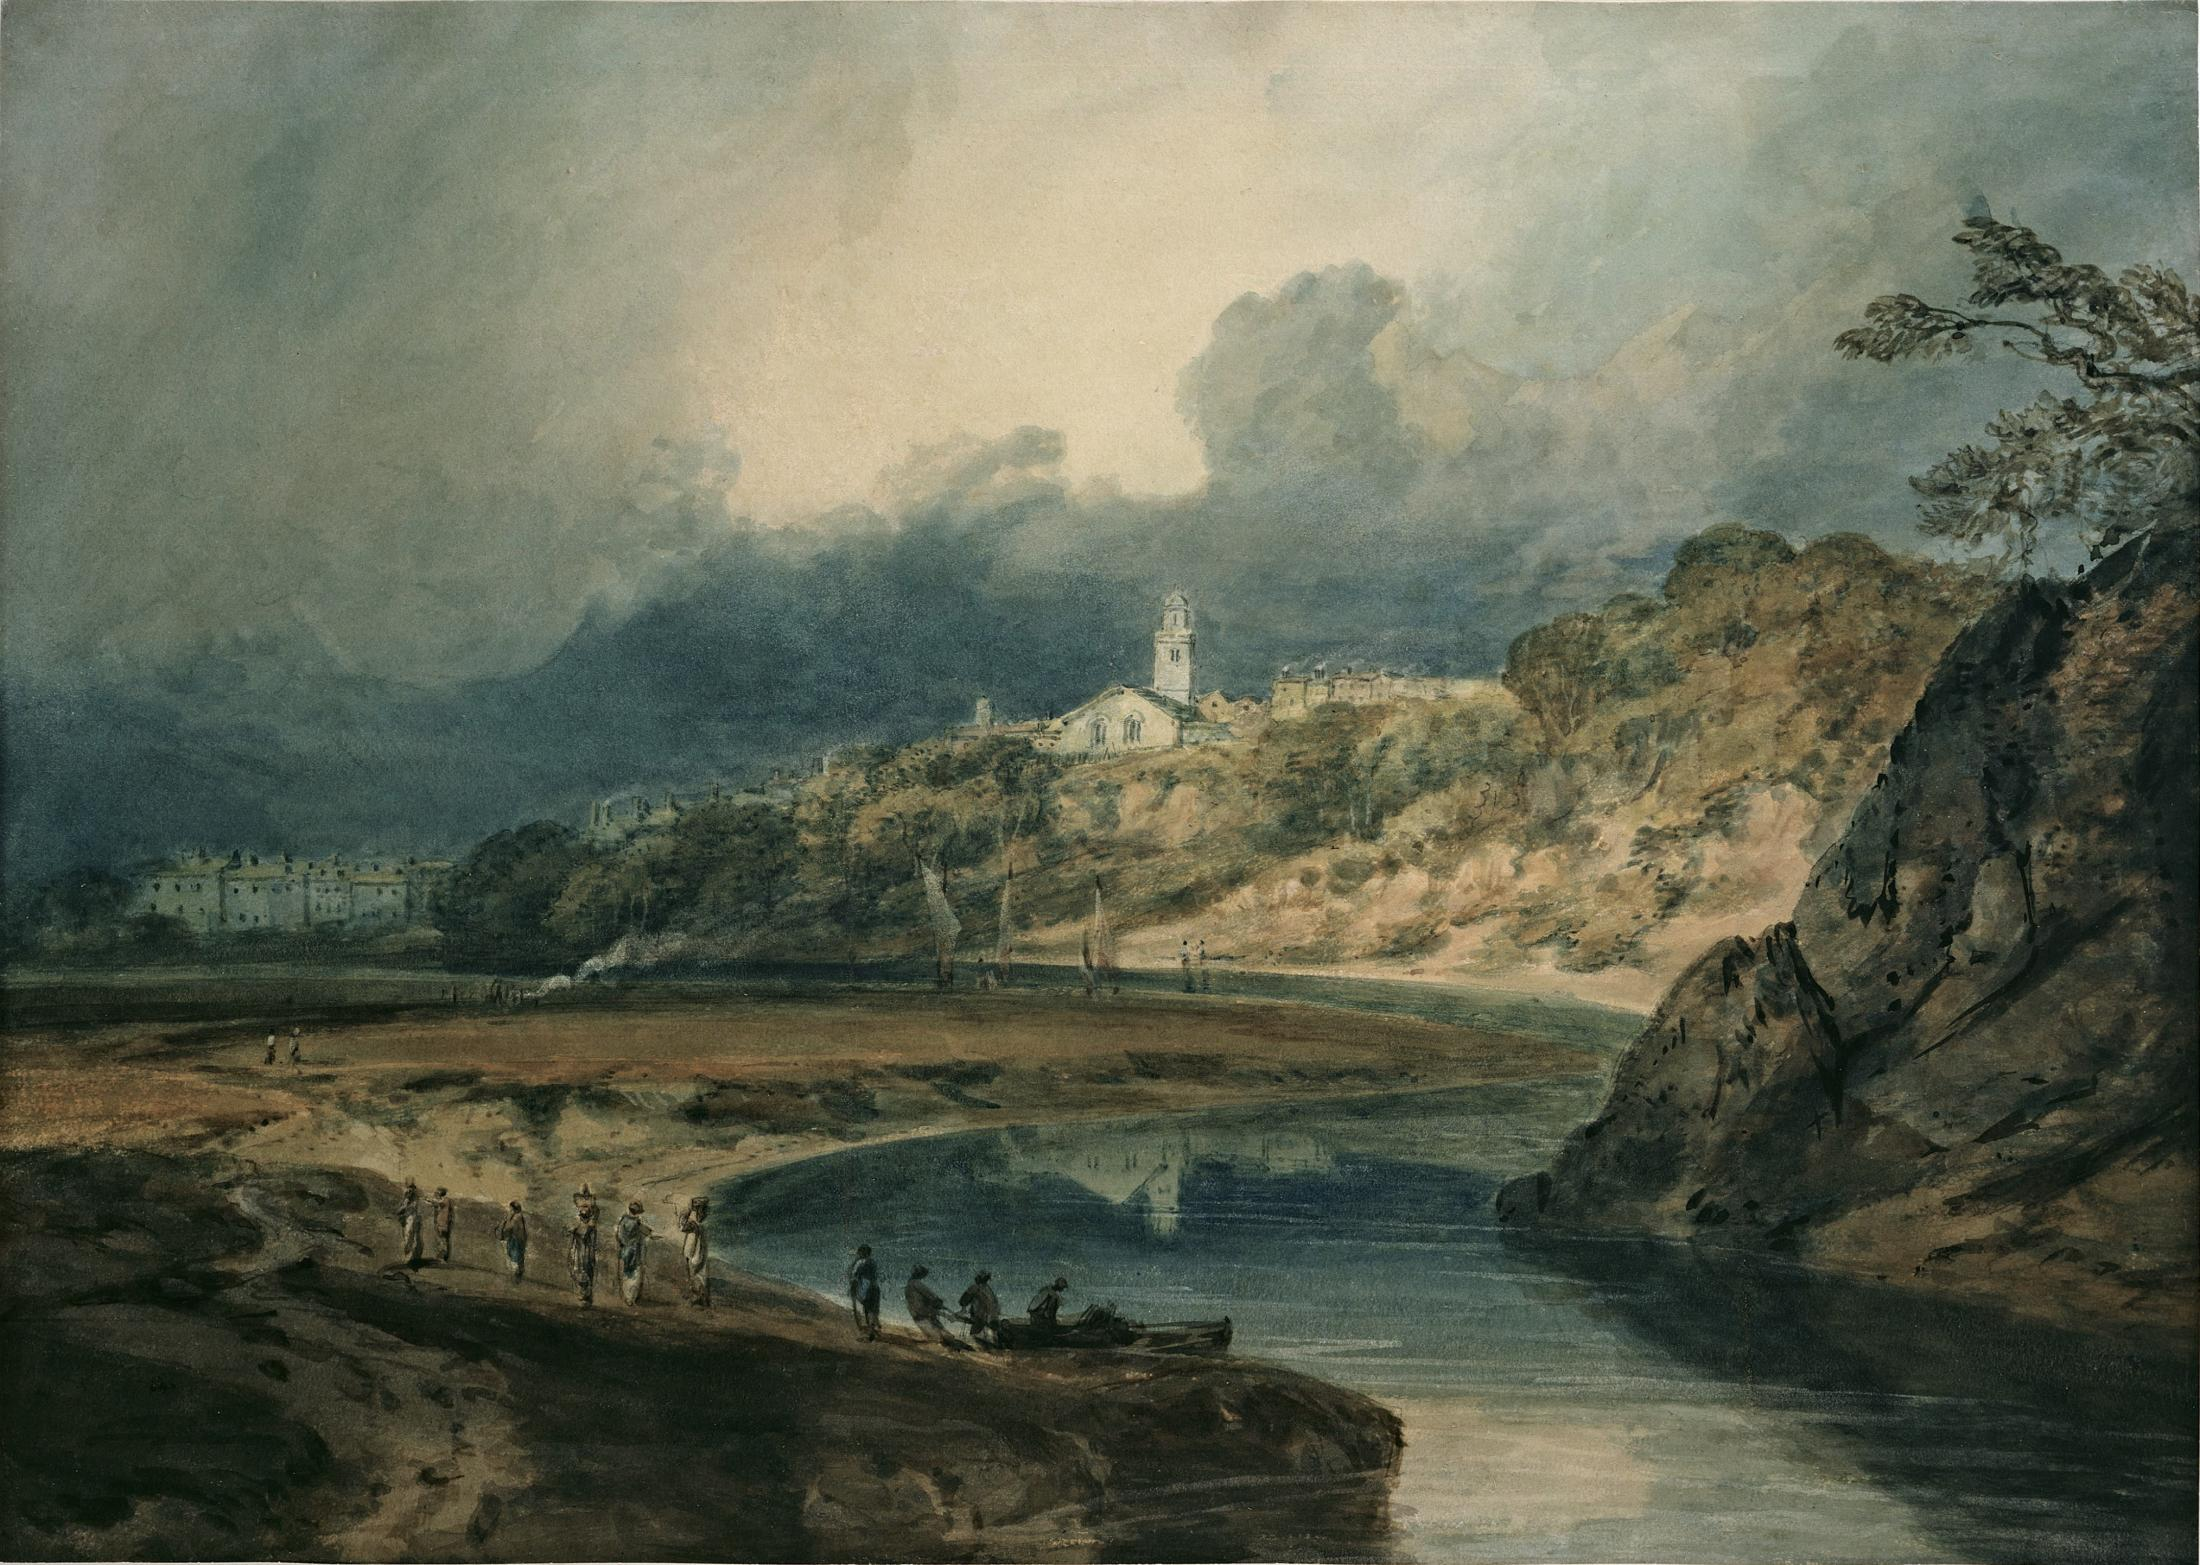 BRIDGNORTH ON THE RIVER SEVERN